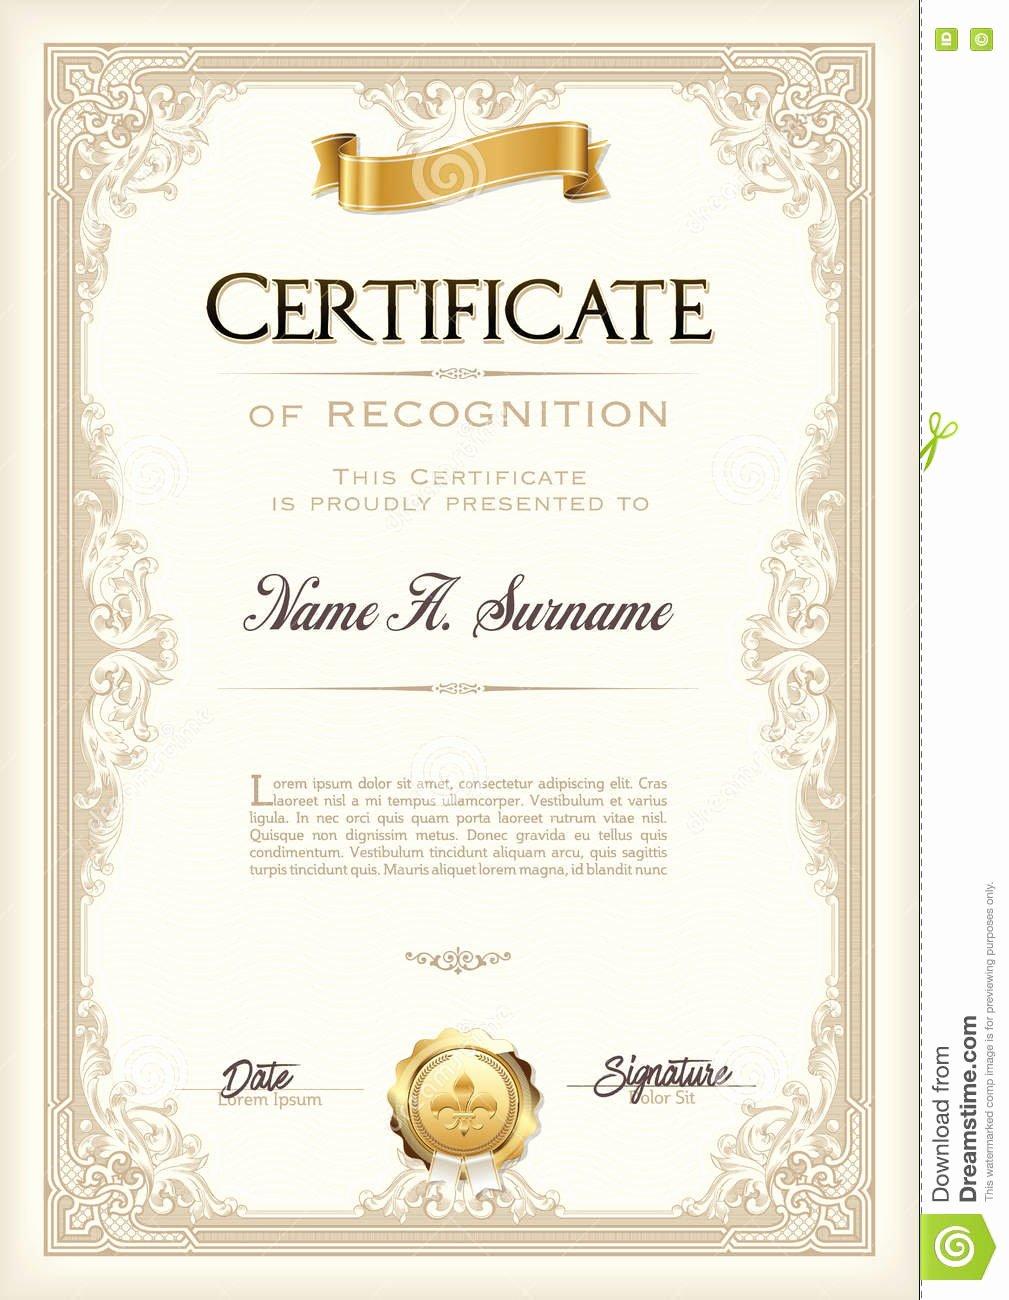 Certificate Of Achievement Frame Elegant Certificate Achievement Vintage Frame with Gold Ribbon